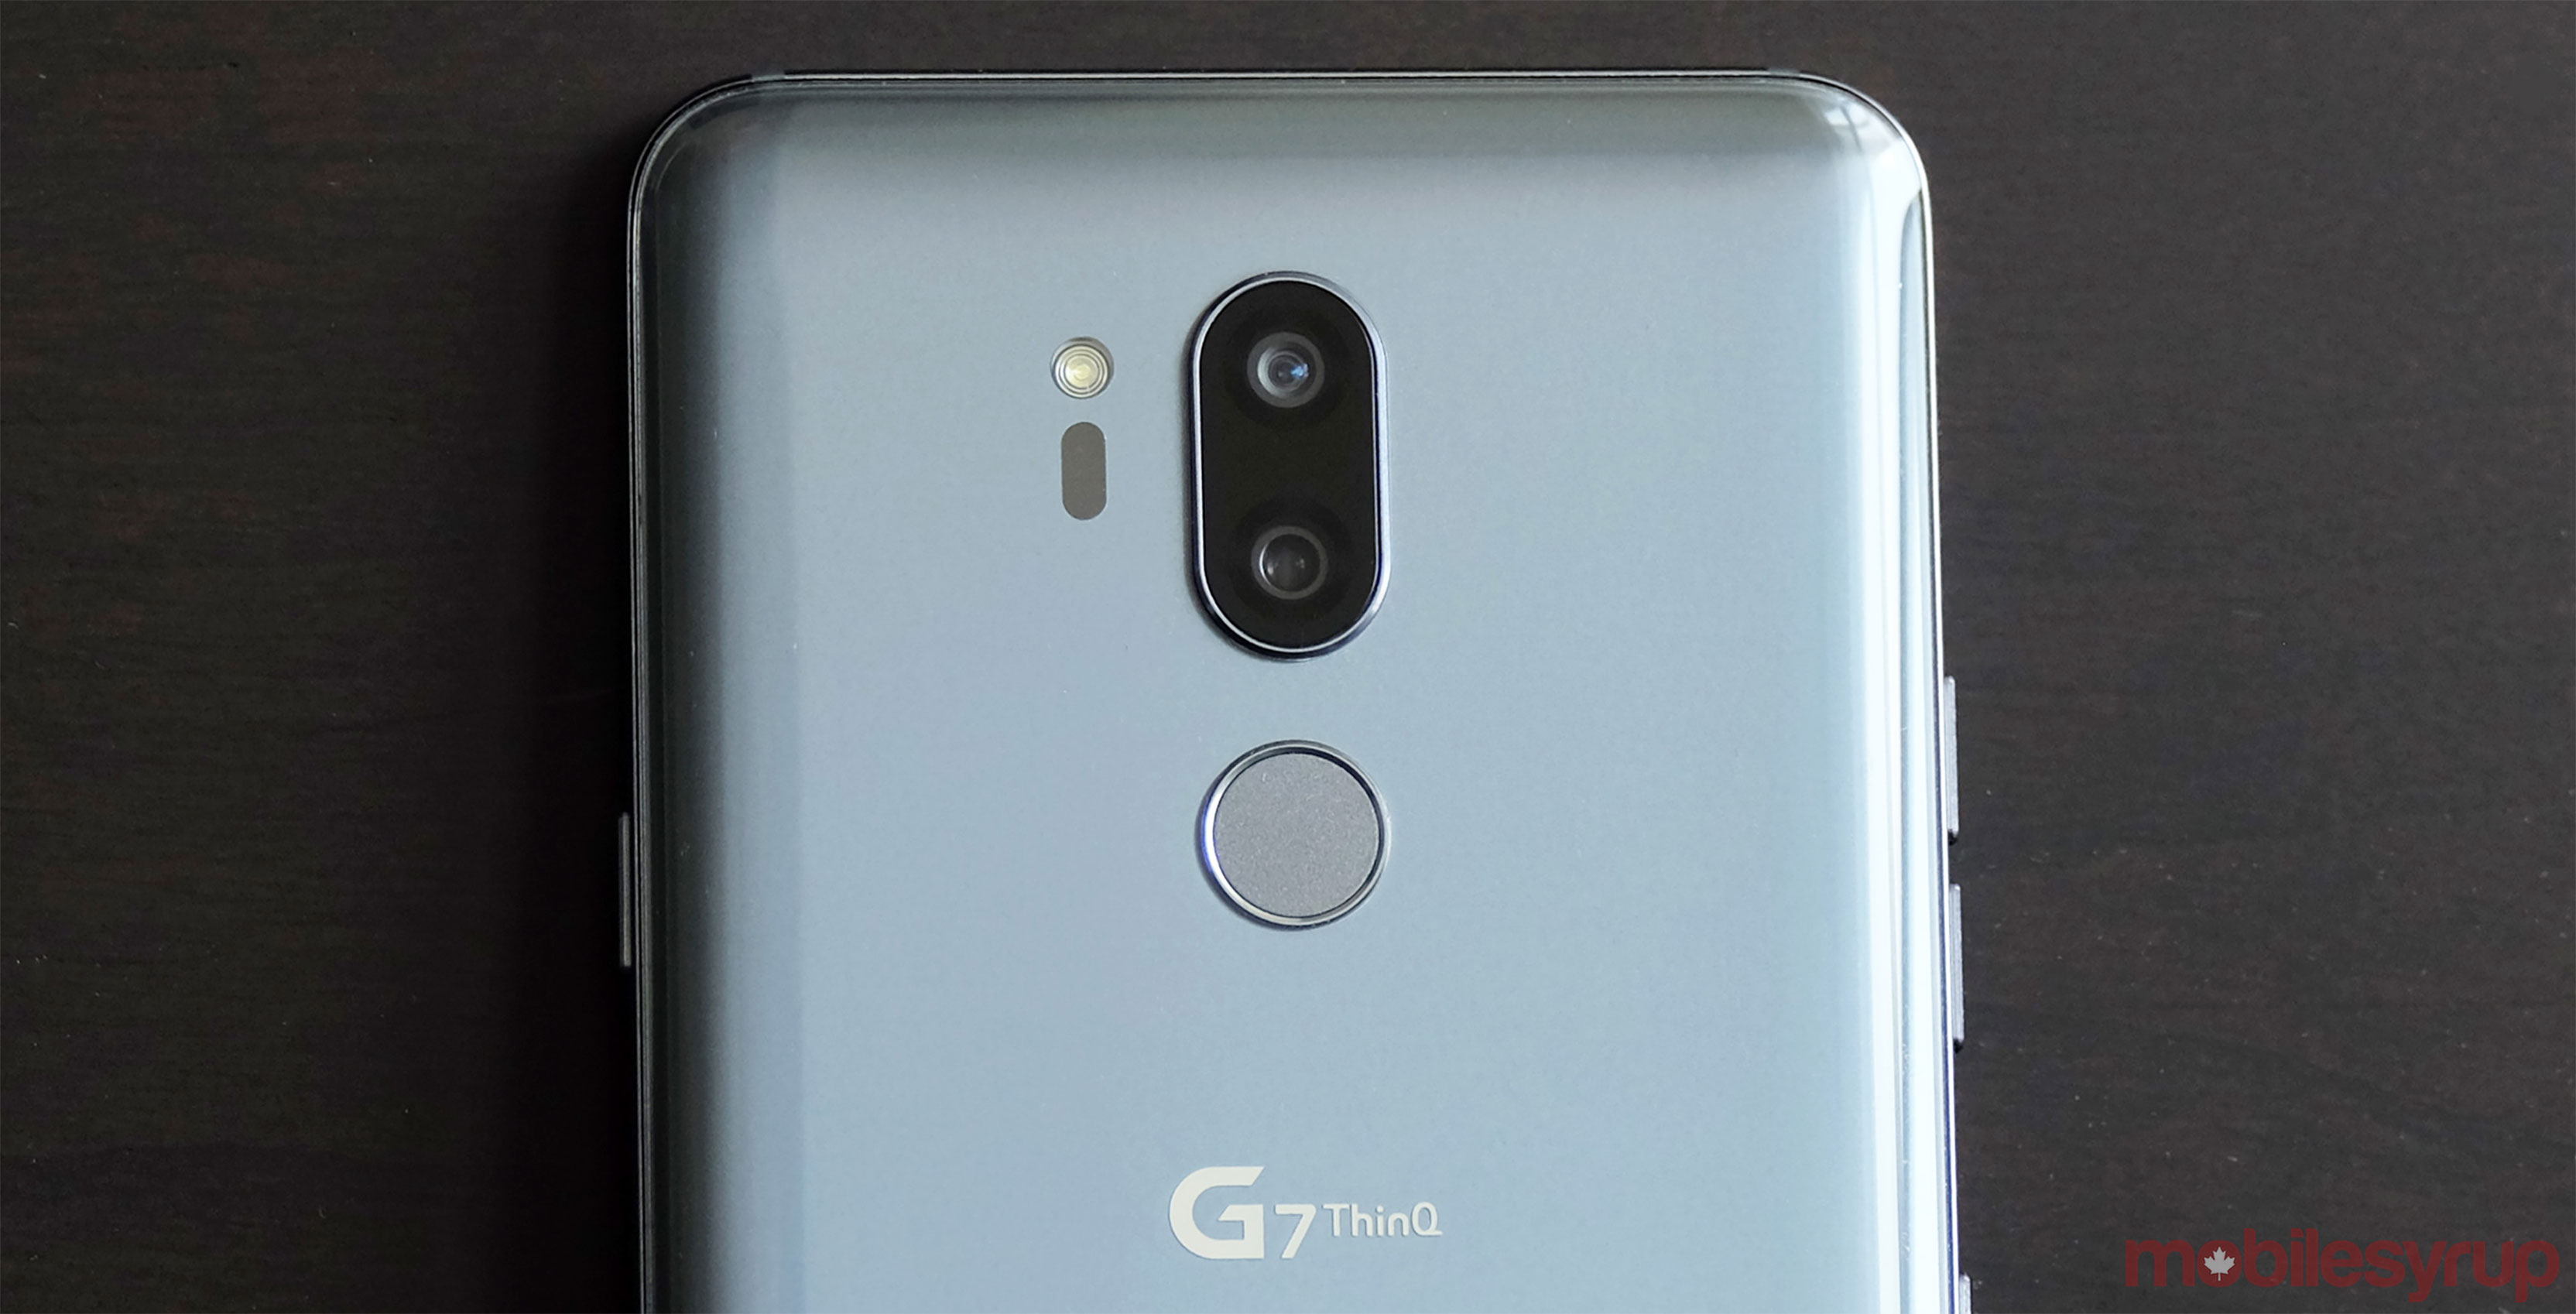 LG G7 Thin Q camera